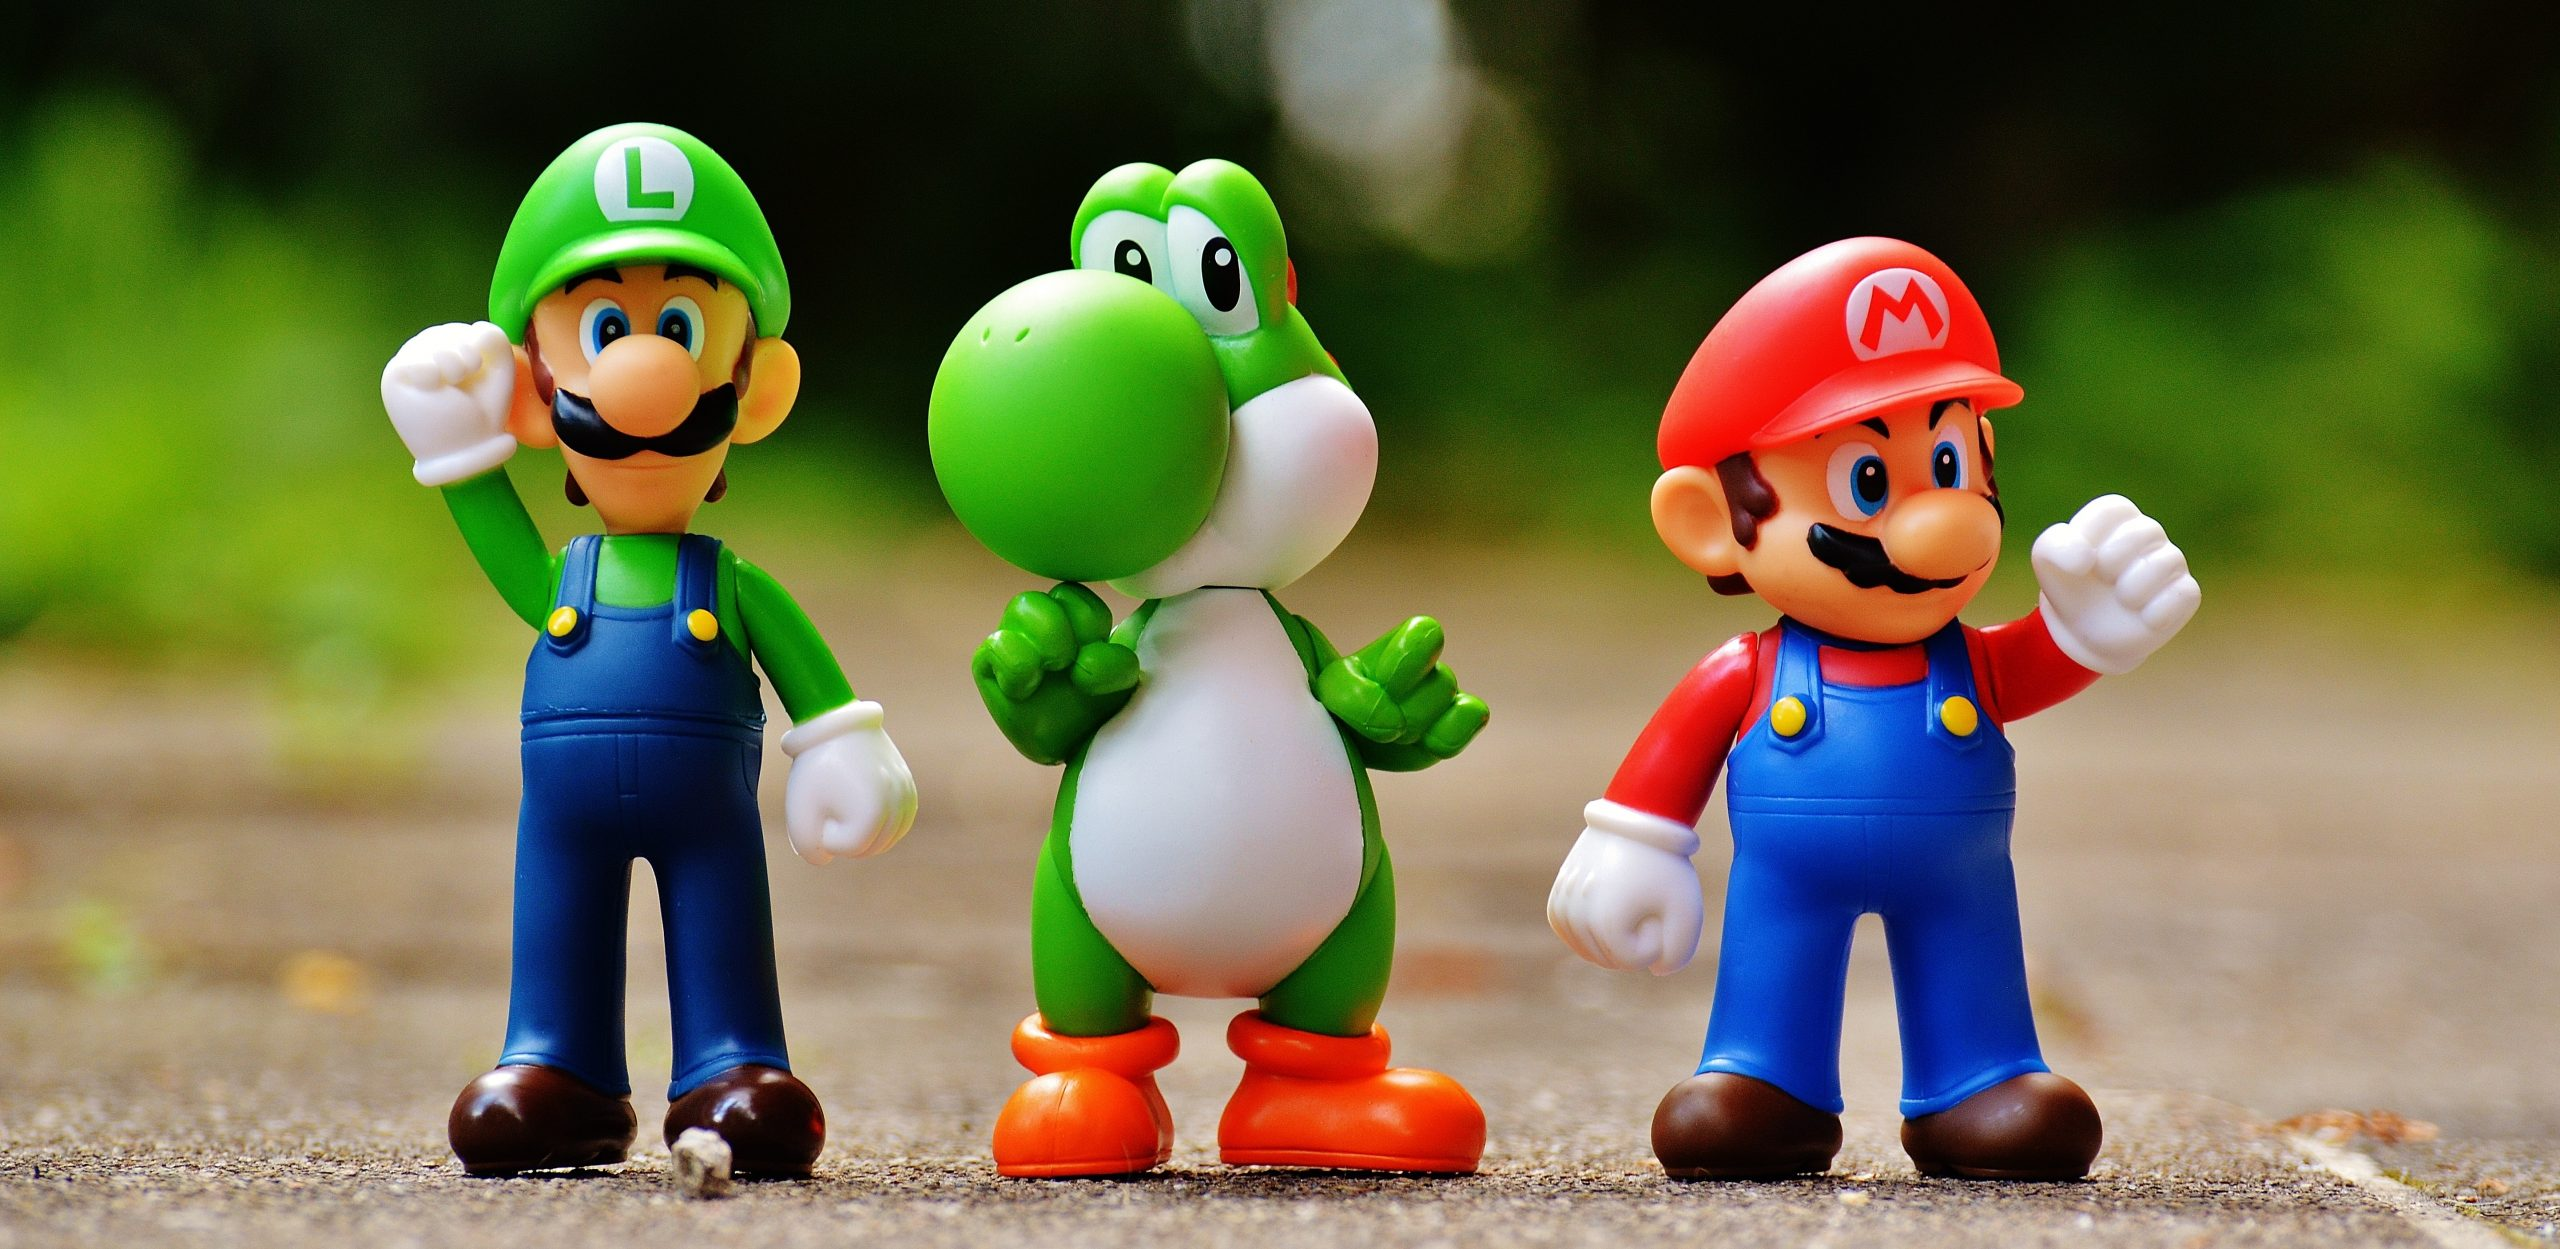 pexels-pixabay-163036-scaled 5 Famous Super Mario Games